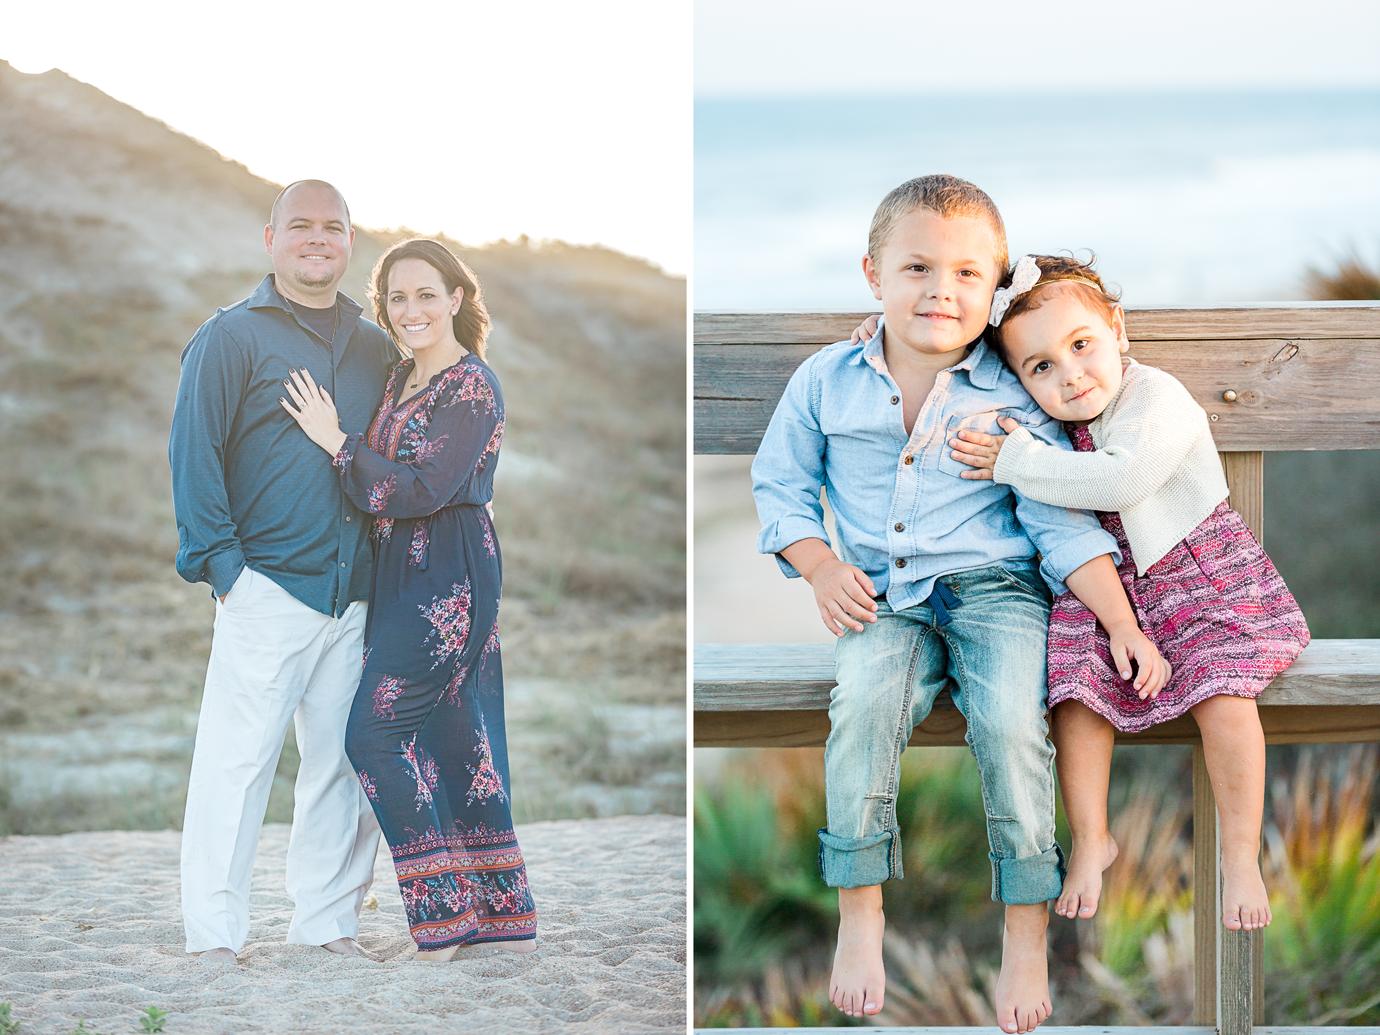 family photoshoot in ponte vedra, fl